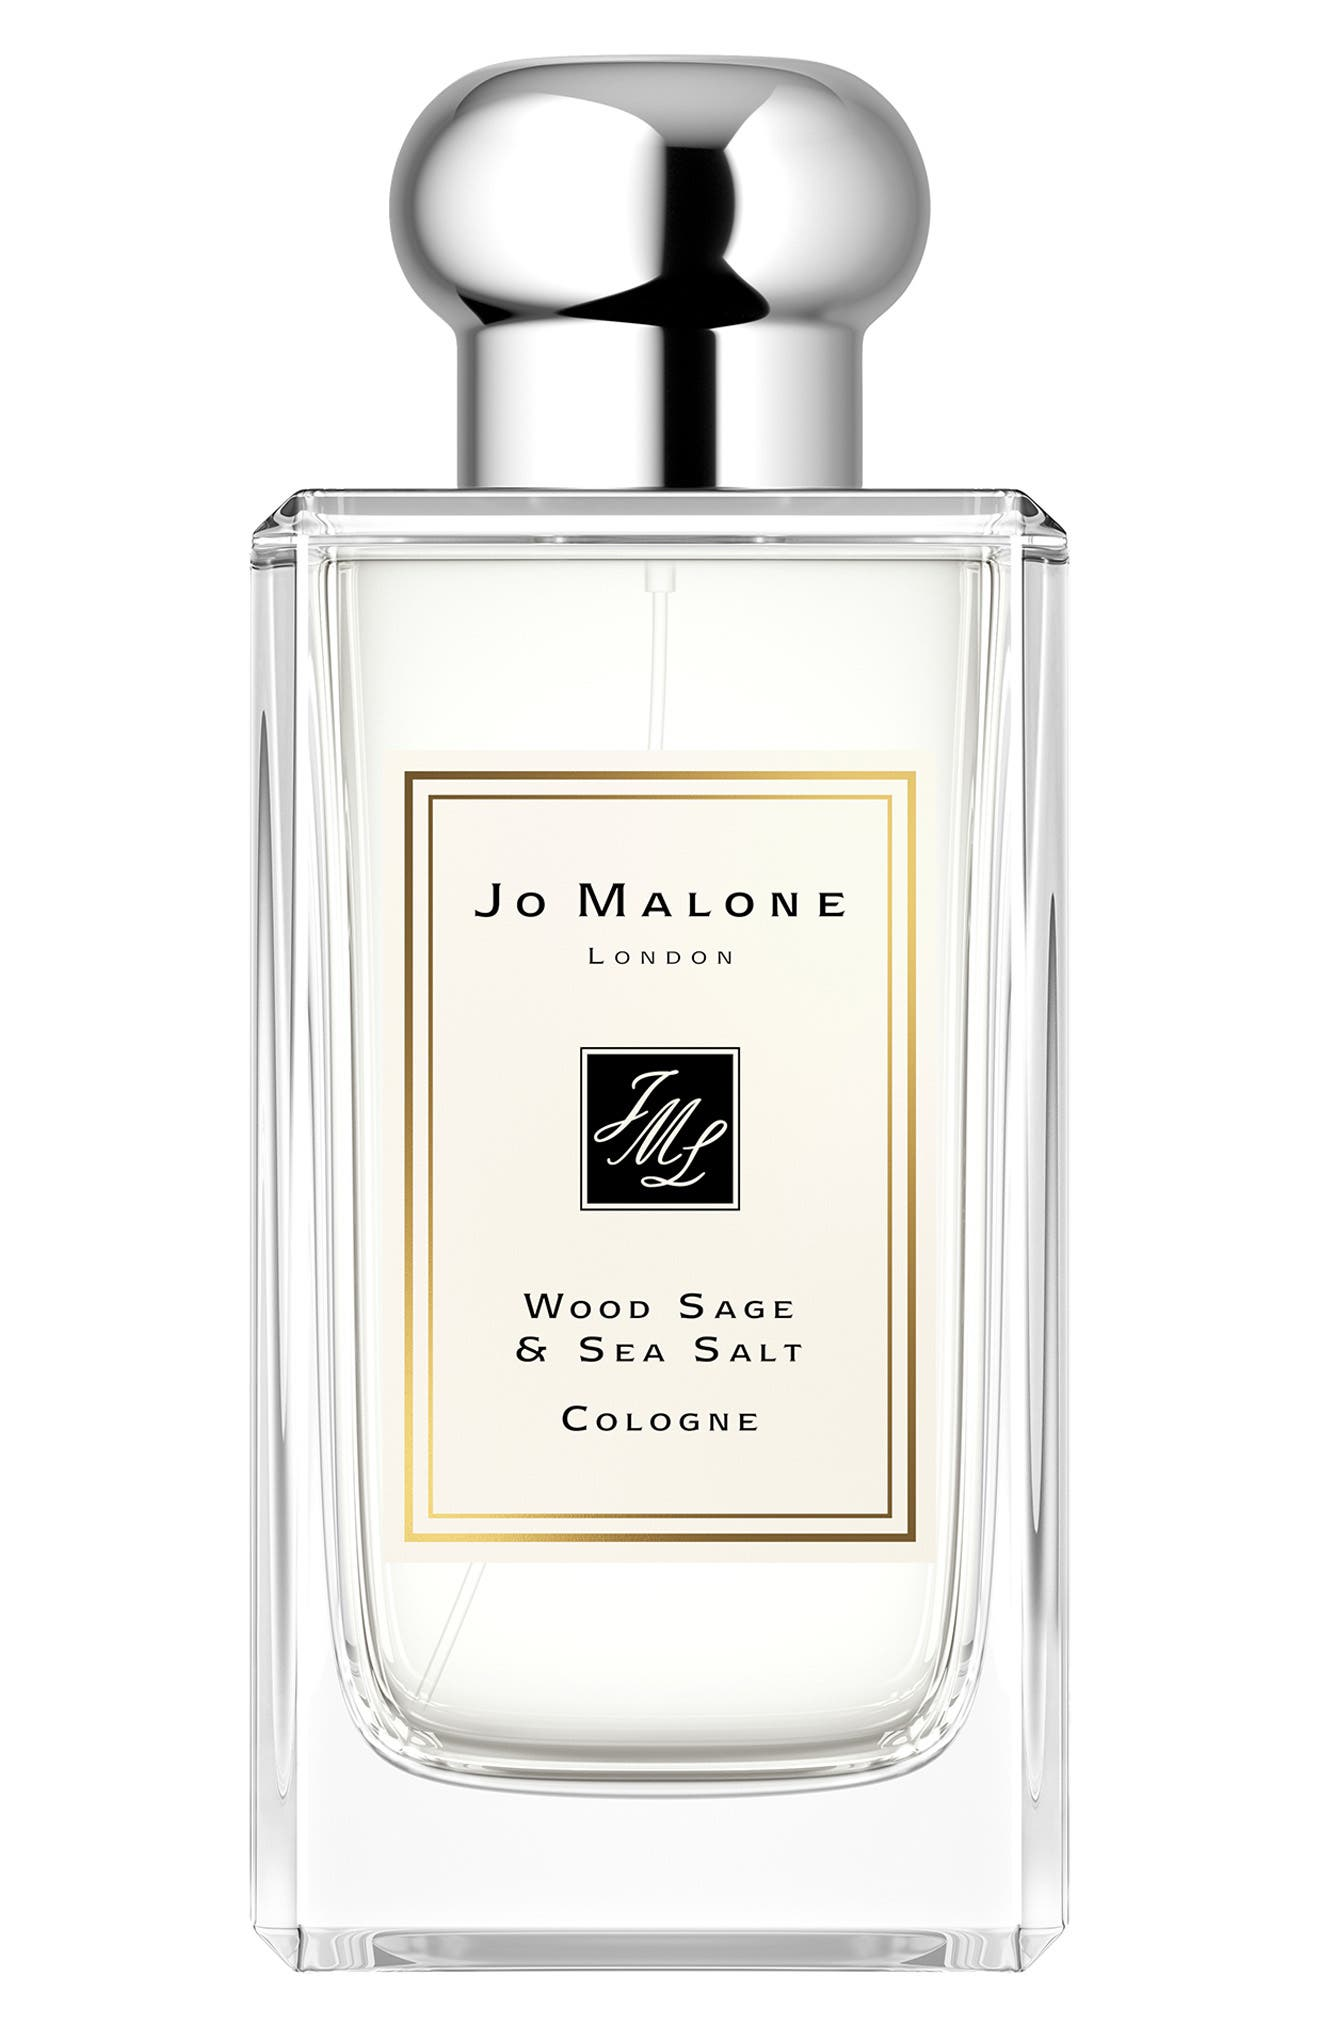 Jo Malone London(TM) Wood Sage & Sea Salt Cologne